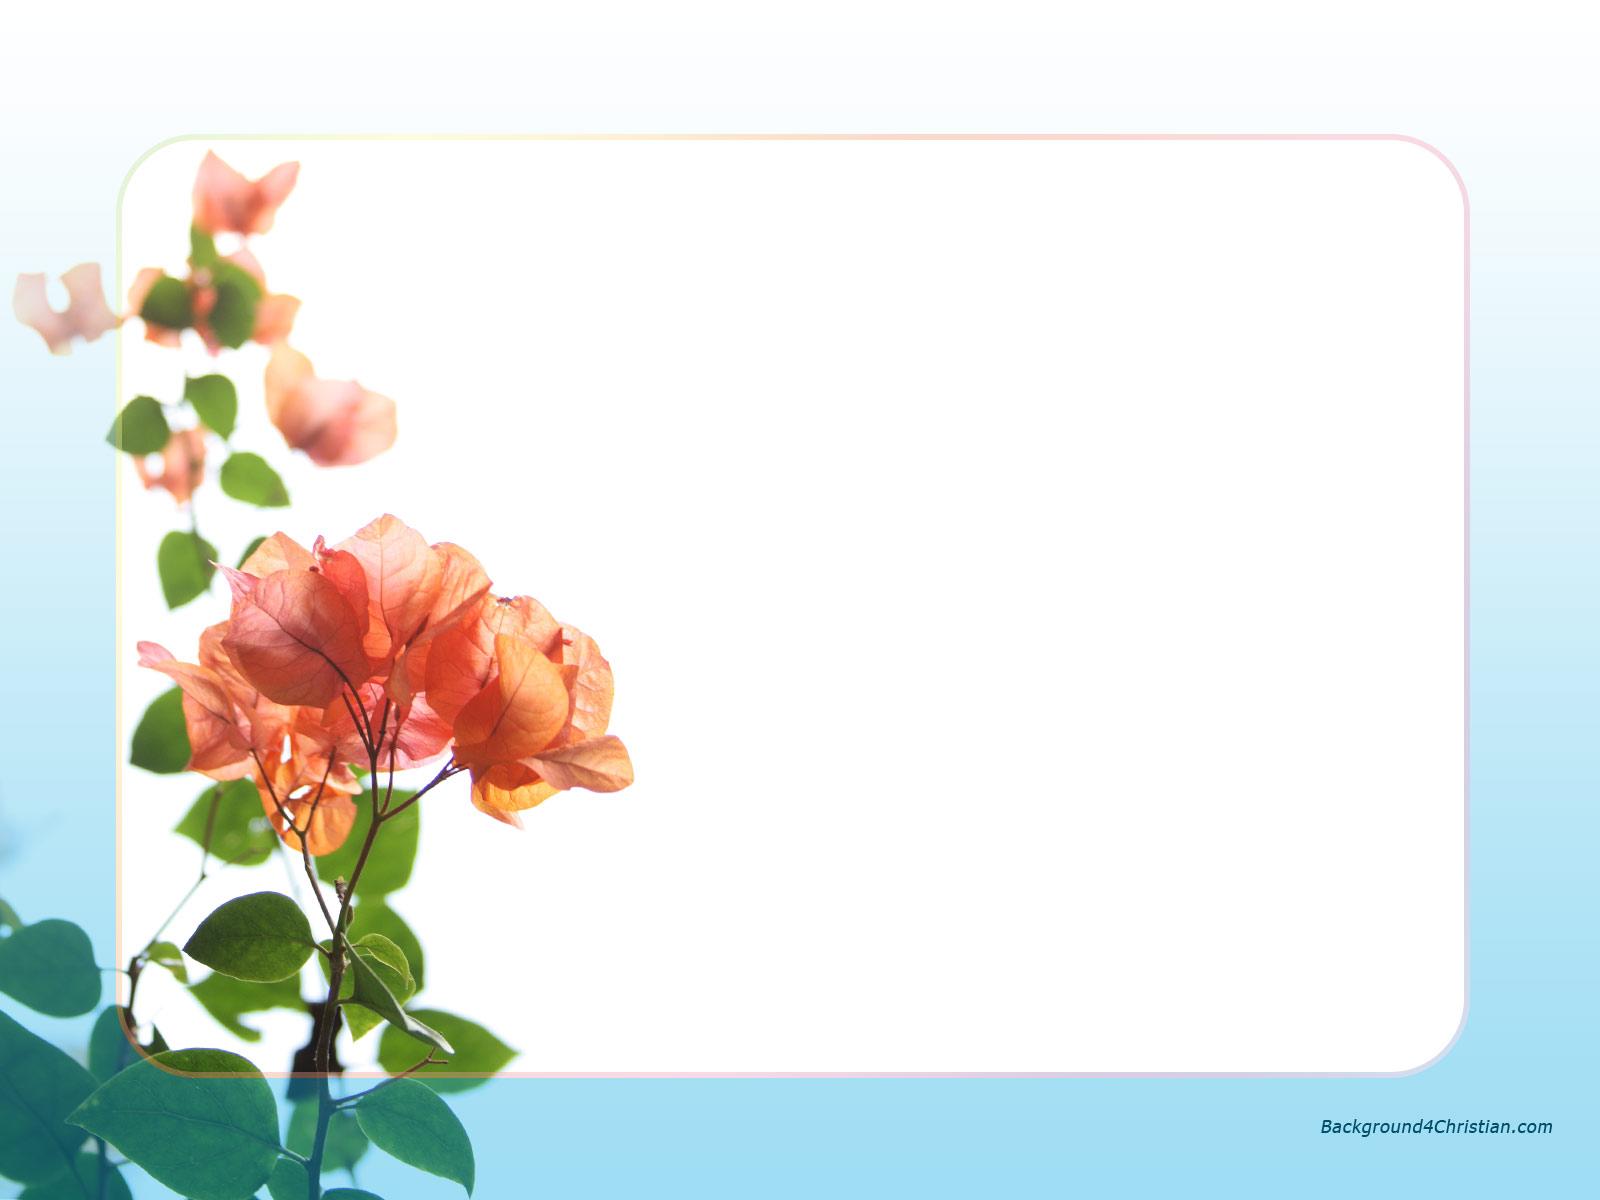 http://4.bp.blogspot.com/-0wEKXJIDuKk/Tp_ioo5hW6I/AAAAAAAABA0/3uU6I7e69fk/s1600/flower-border-frame.jpg